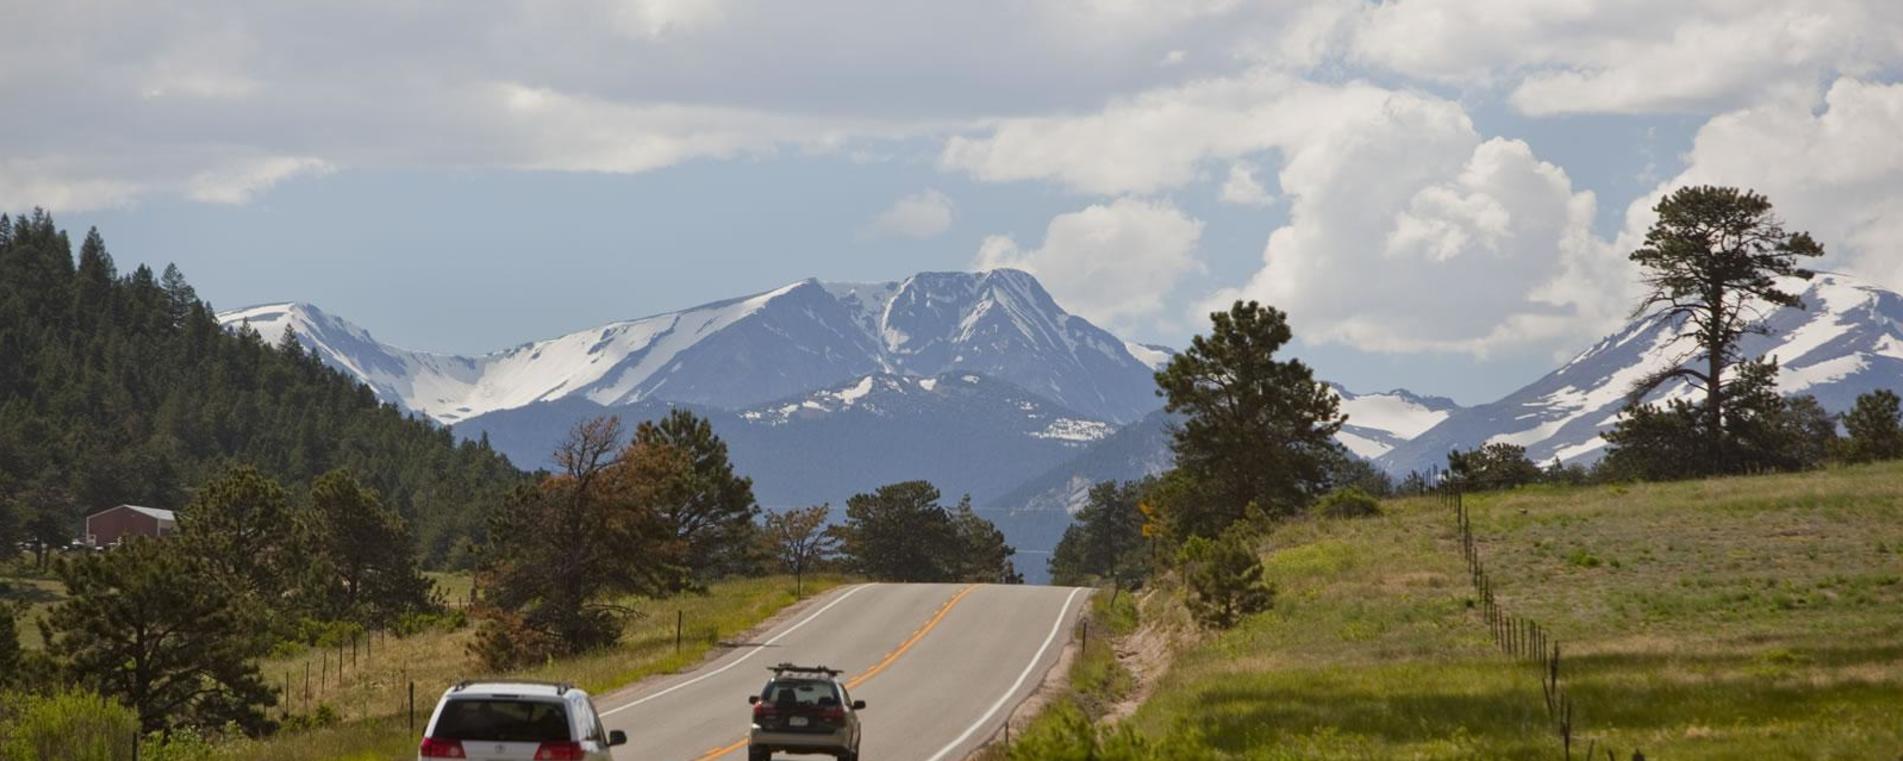 Scenic Drives Into Estes Park via Hwy 7